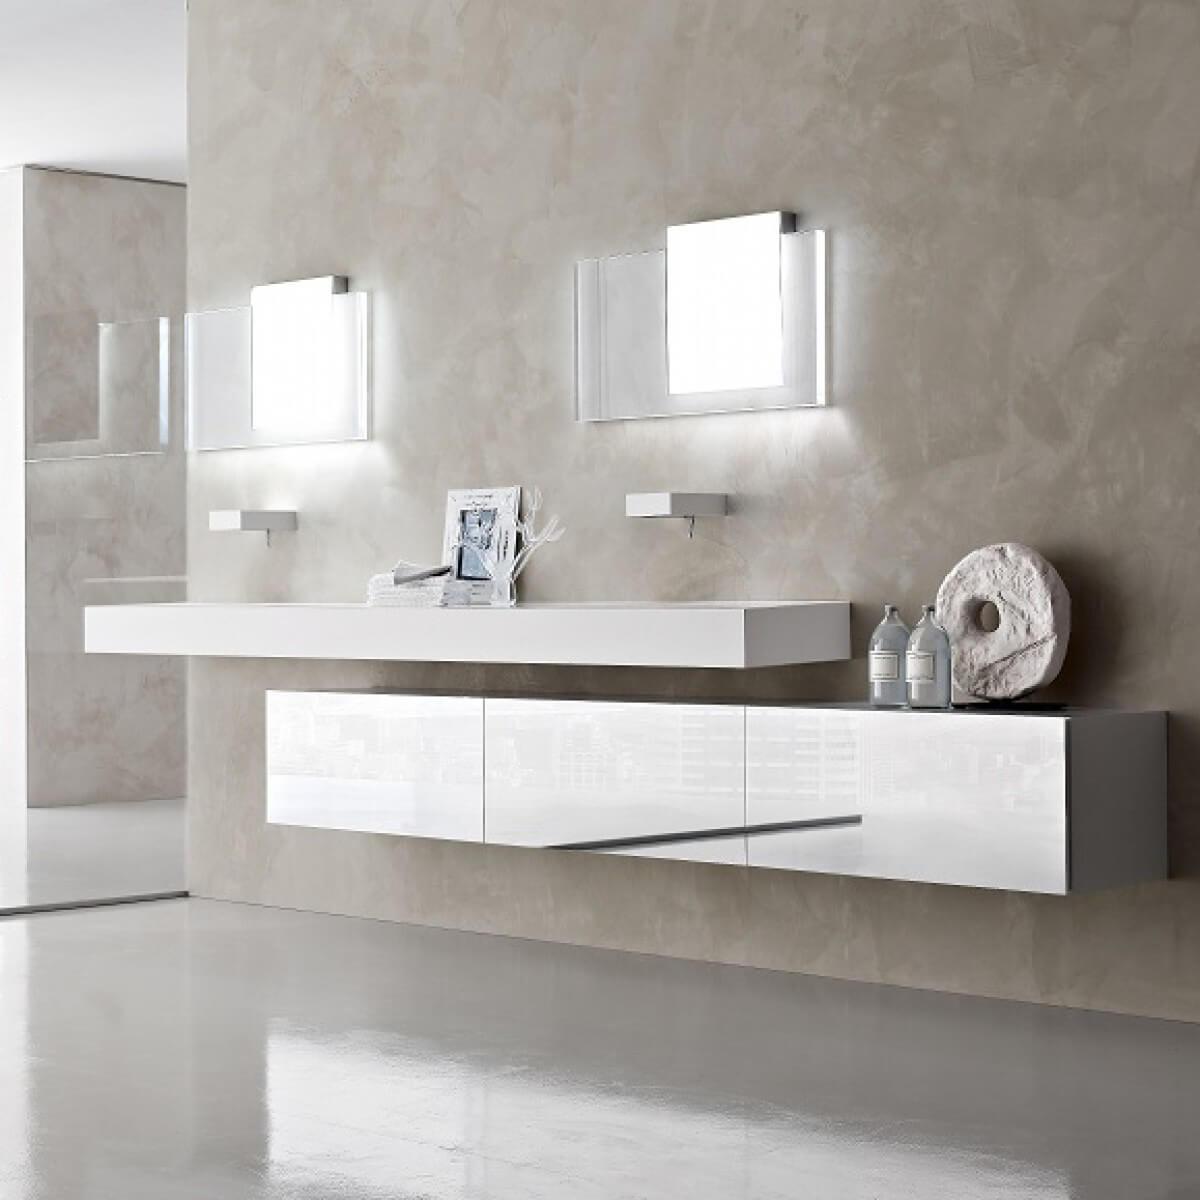 Ultra Modern Bathroom Designs - Update the Decor of Your Bathroom ...